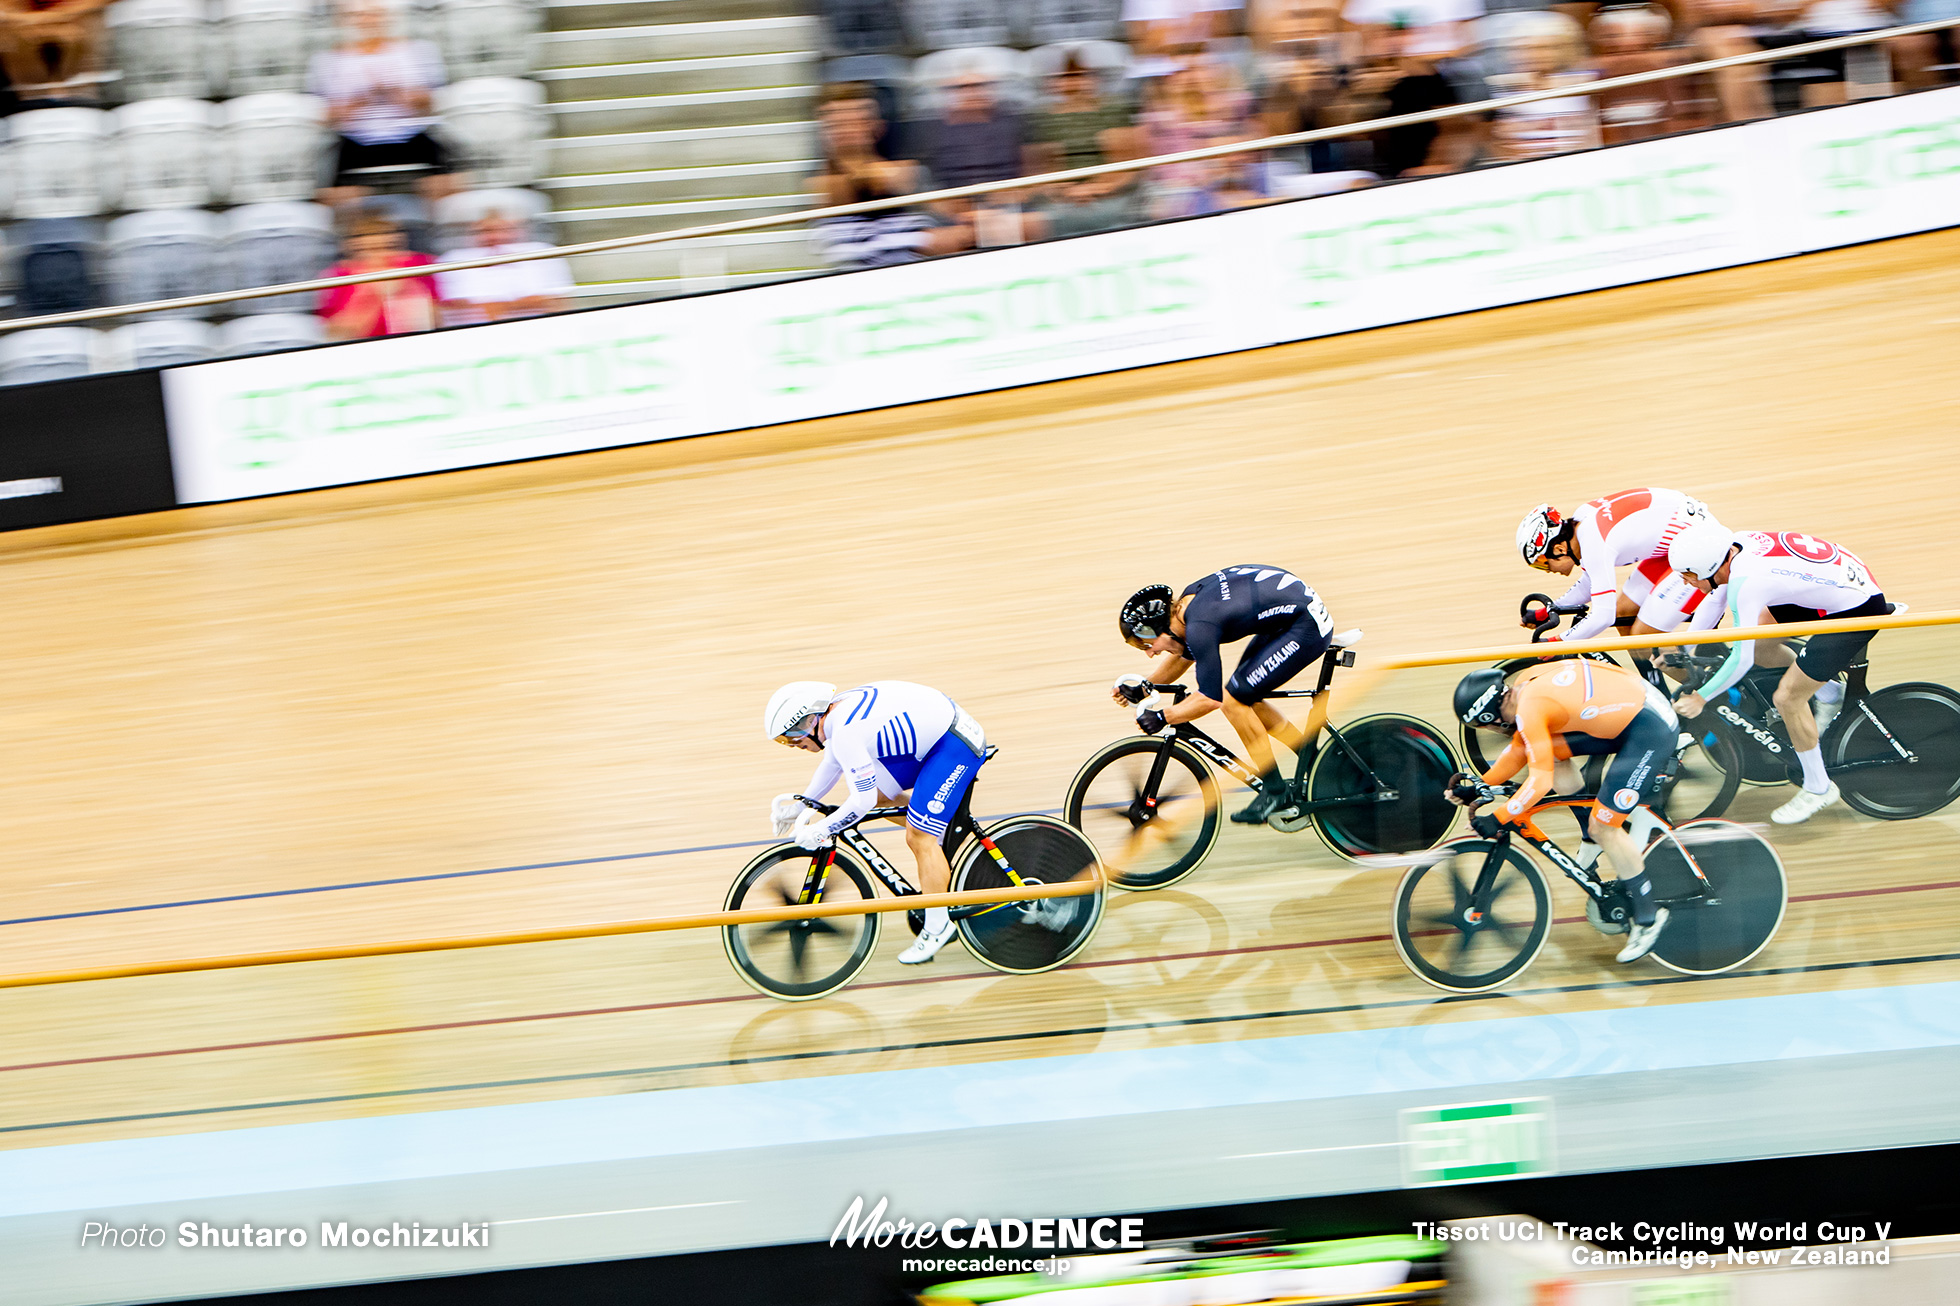 Scratch Race / Women's Omnium / Track Cycling World Cup V / Cambridge, New Zealand